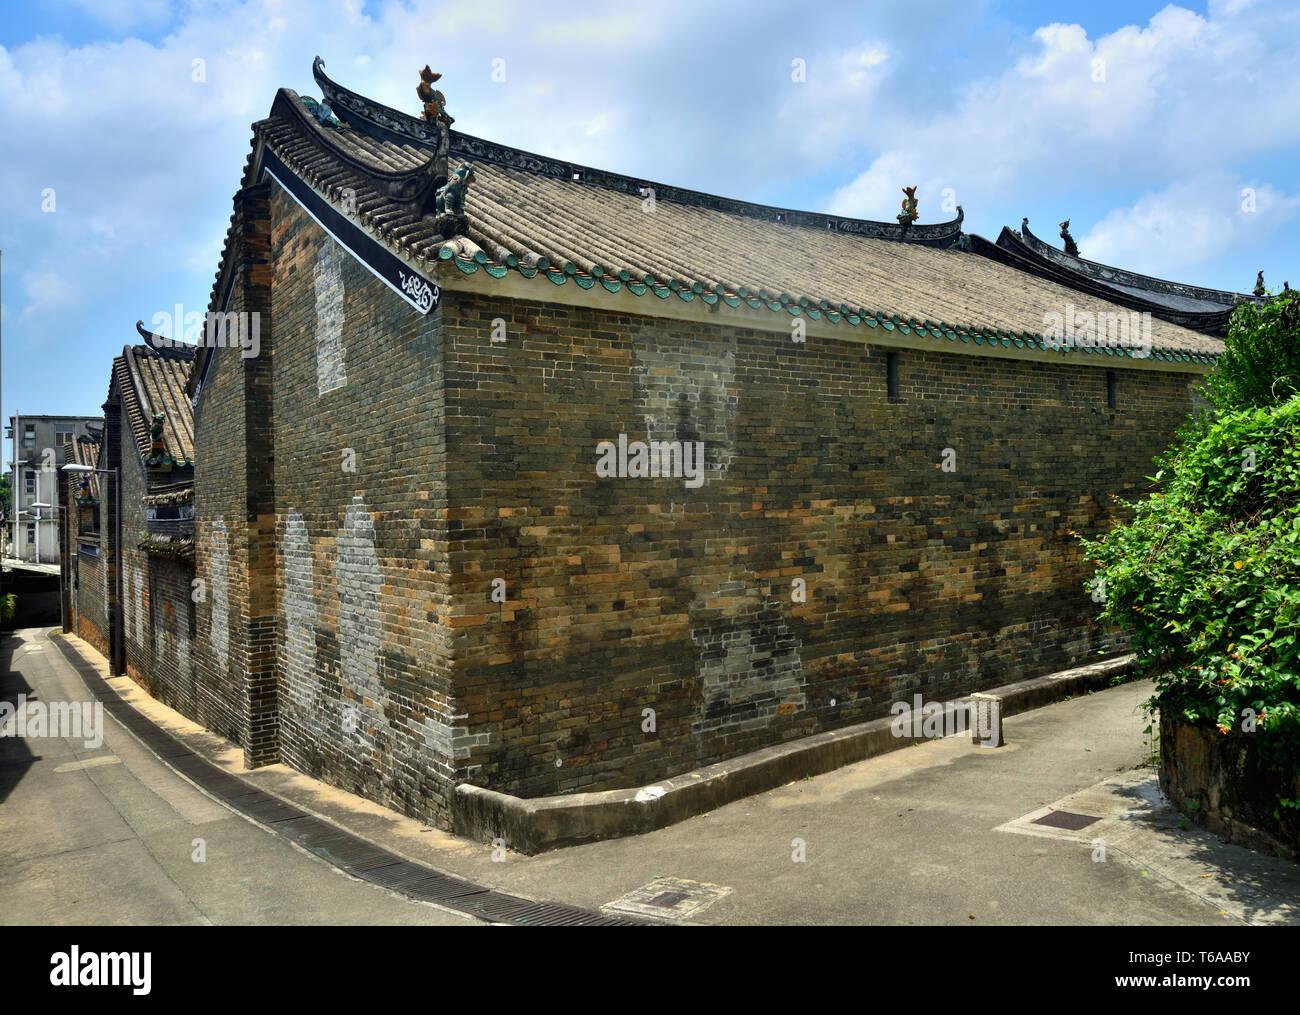 Antico stile cinese case in mattoni, Ping Shan, Hong Kong Immagini Stock